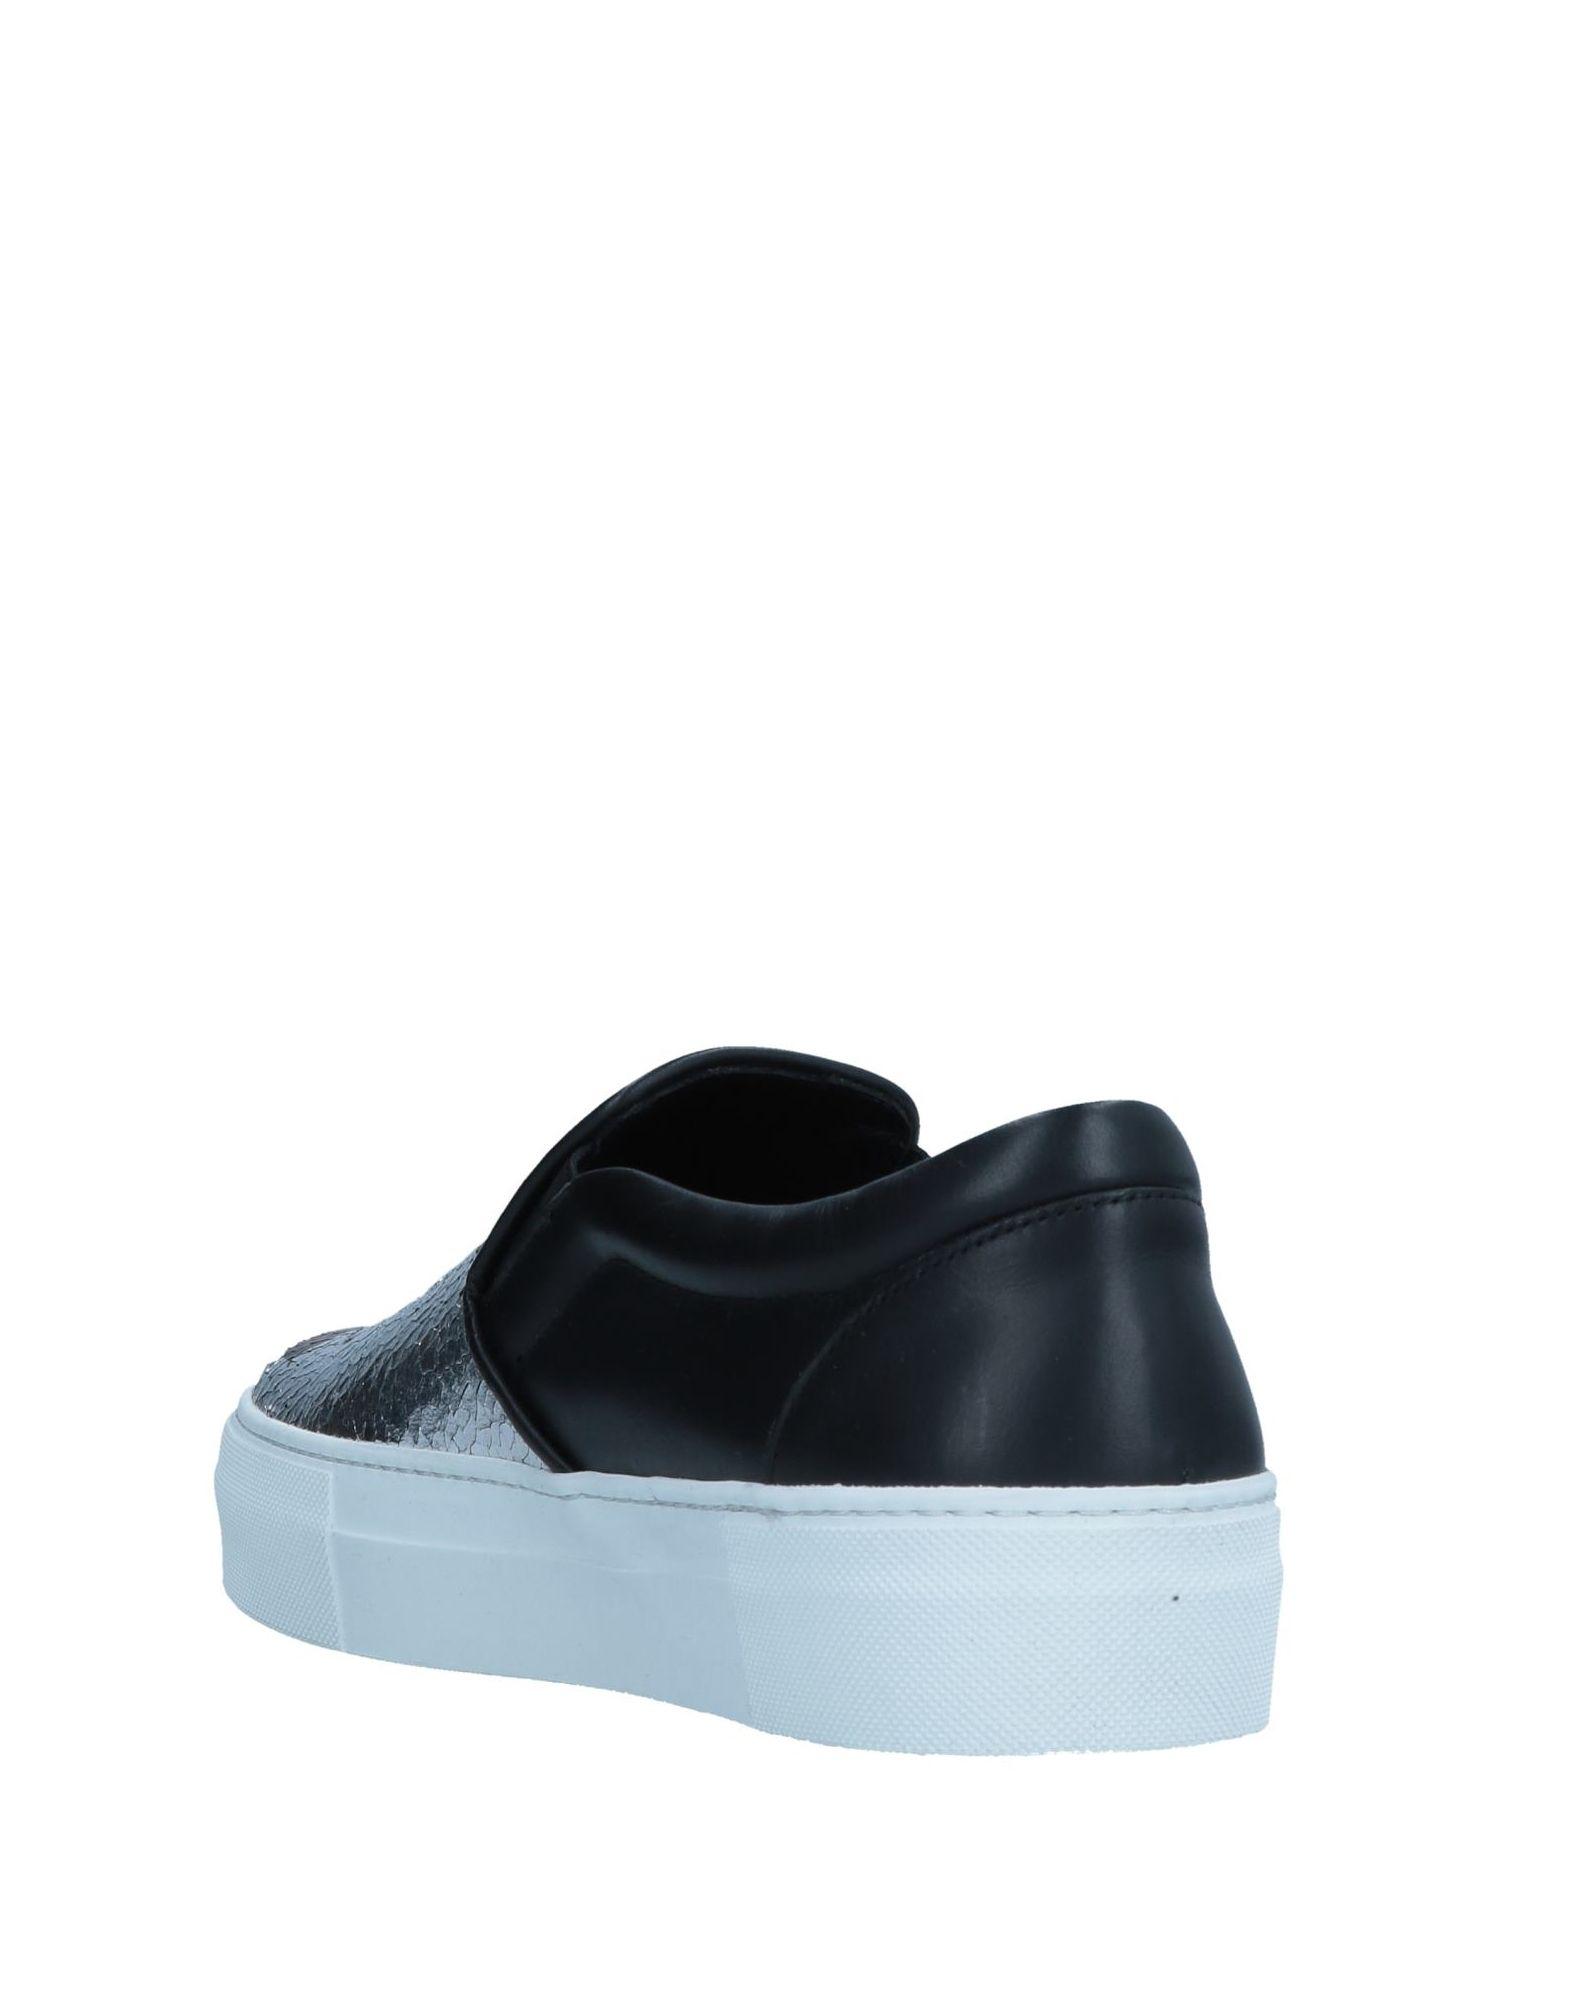 Simon Scott Sneakers - Women Simon Scott Sneakers online on on on  United Kingdom - 11543489XP 0a47cd